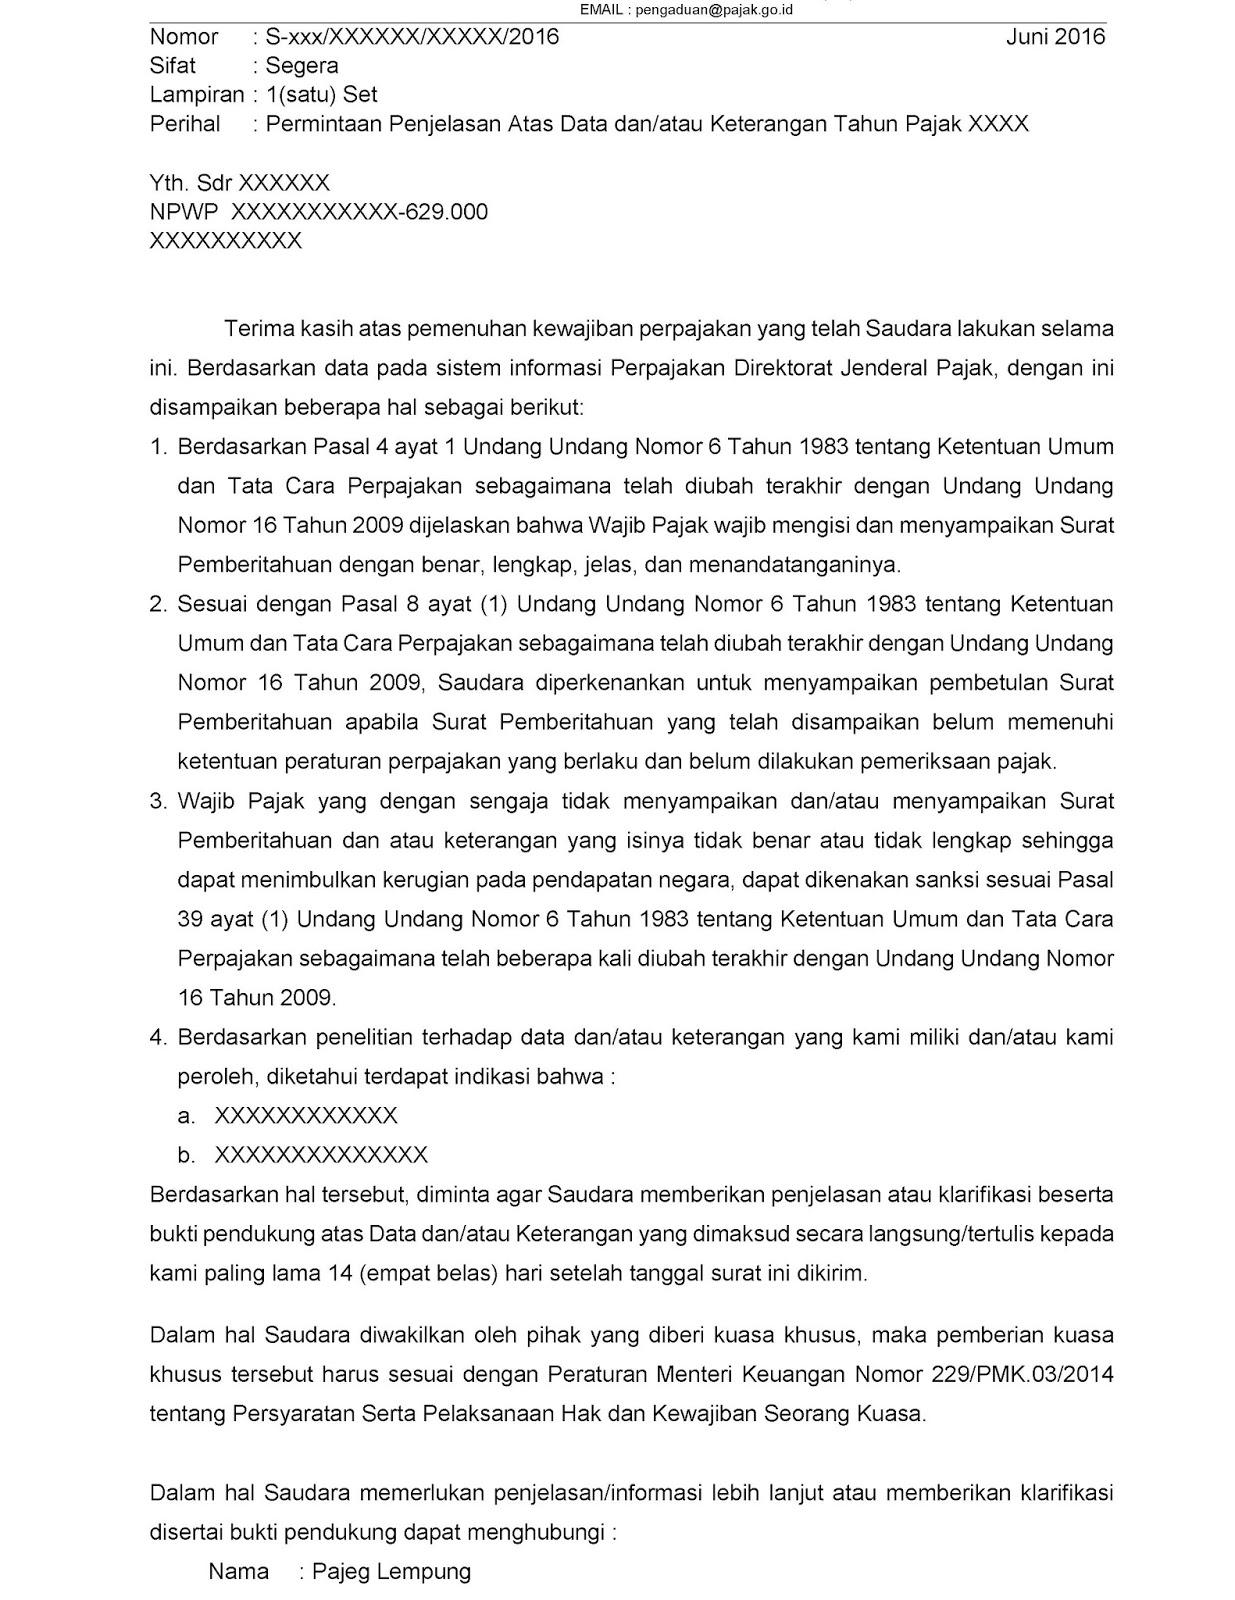 Contoh Laporan Penelitian Desa Contoh Proposal Proyek Contoh Laporan Ziarah Contoh 37 Contoh